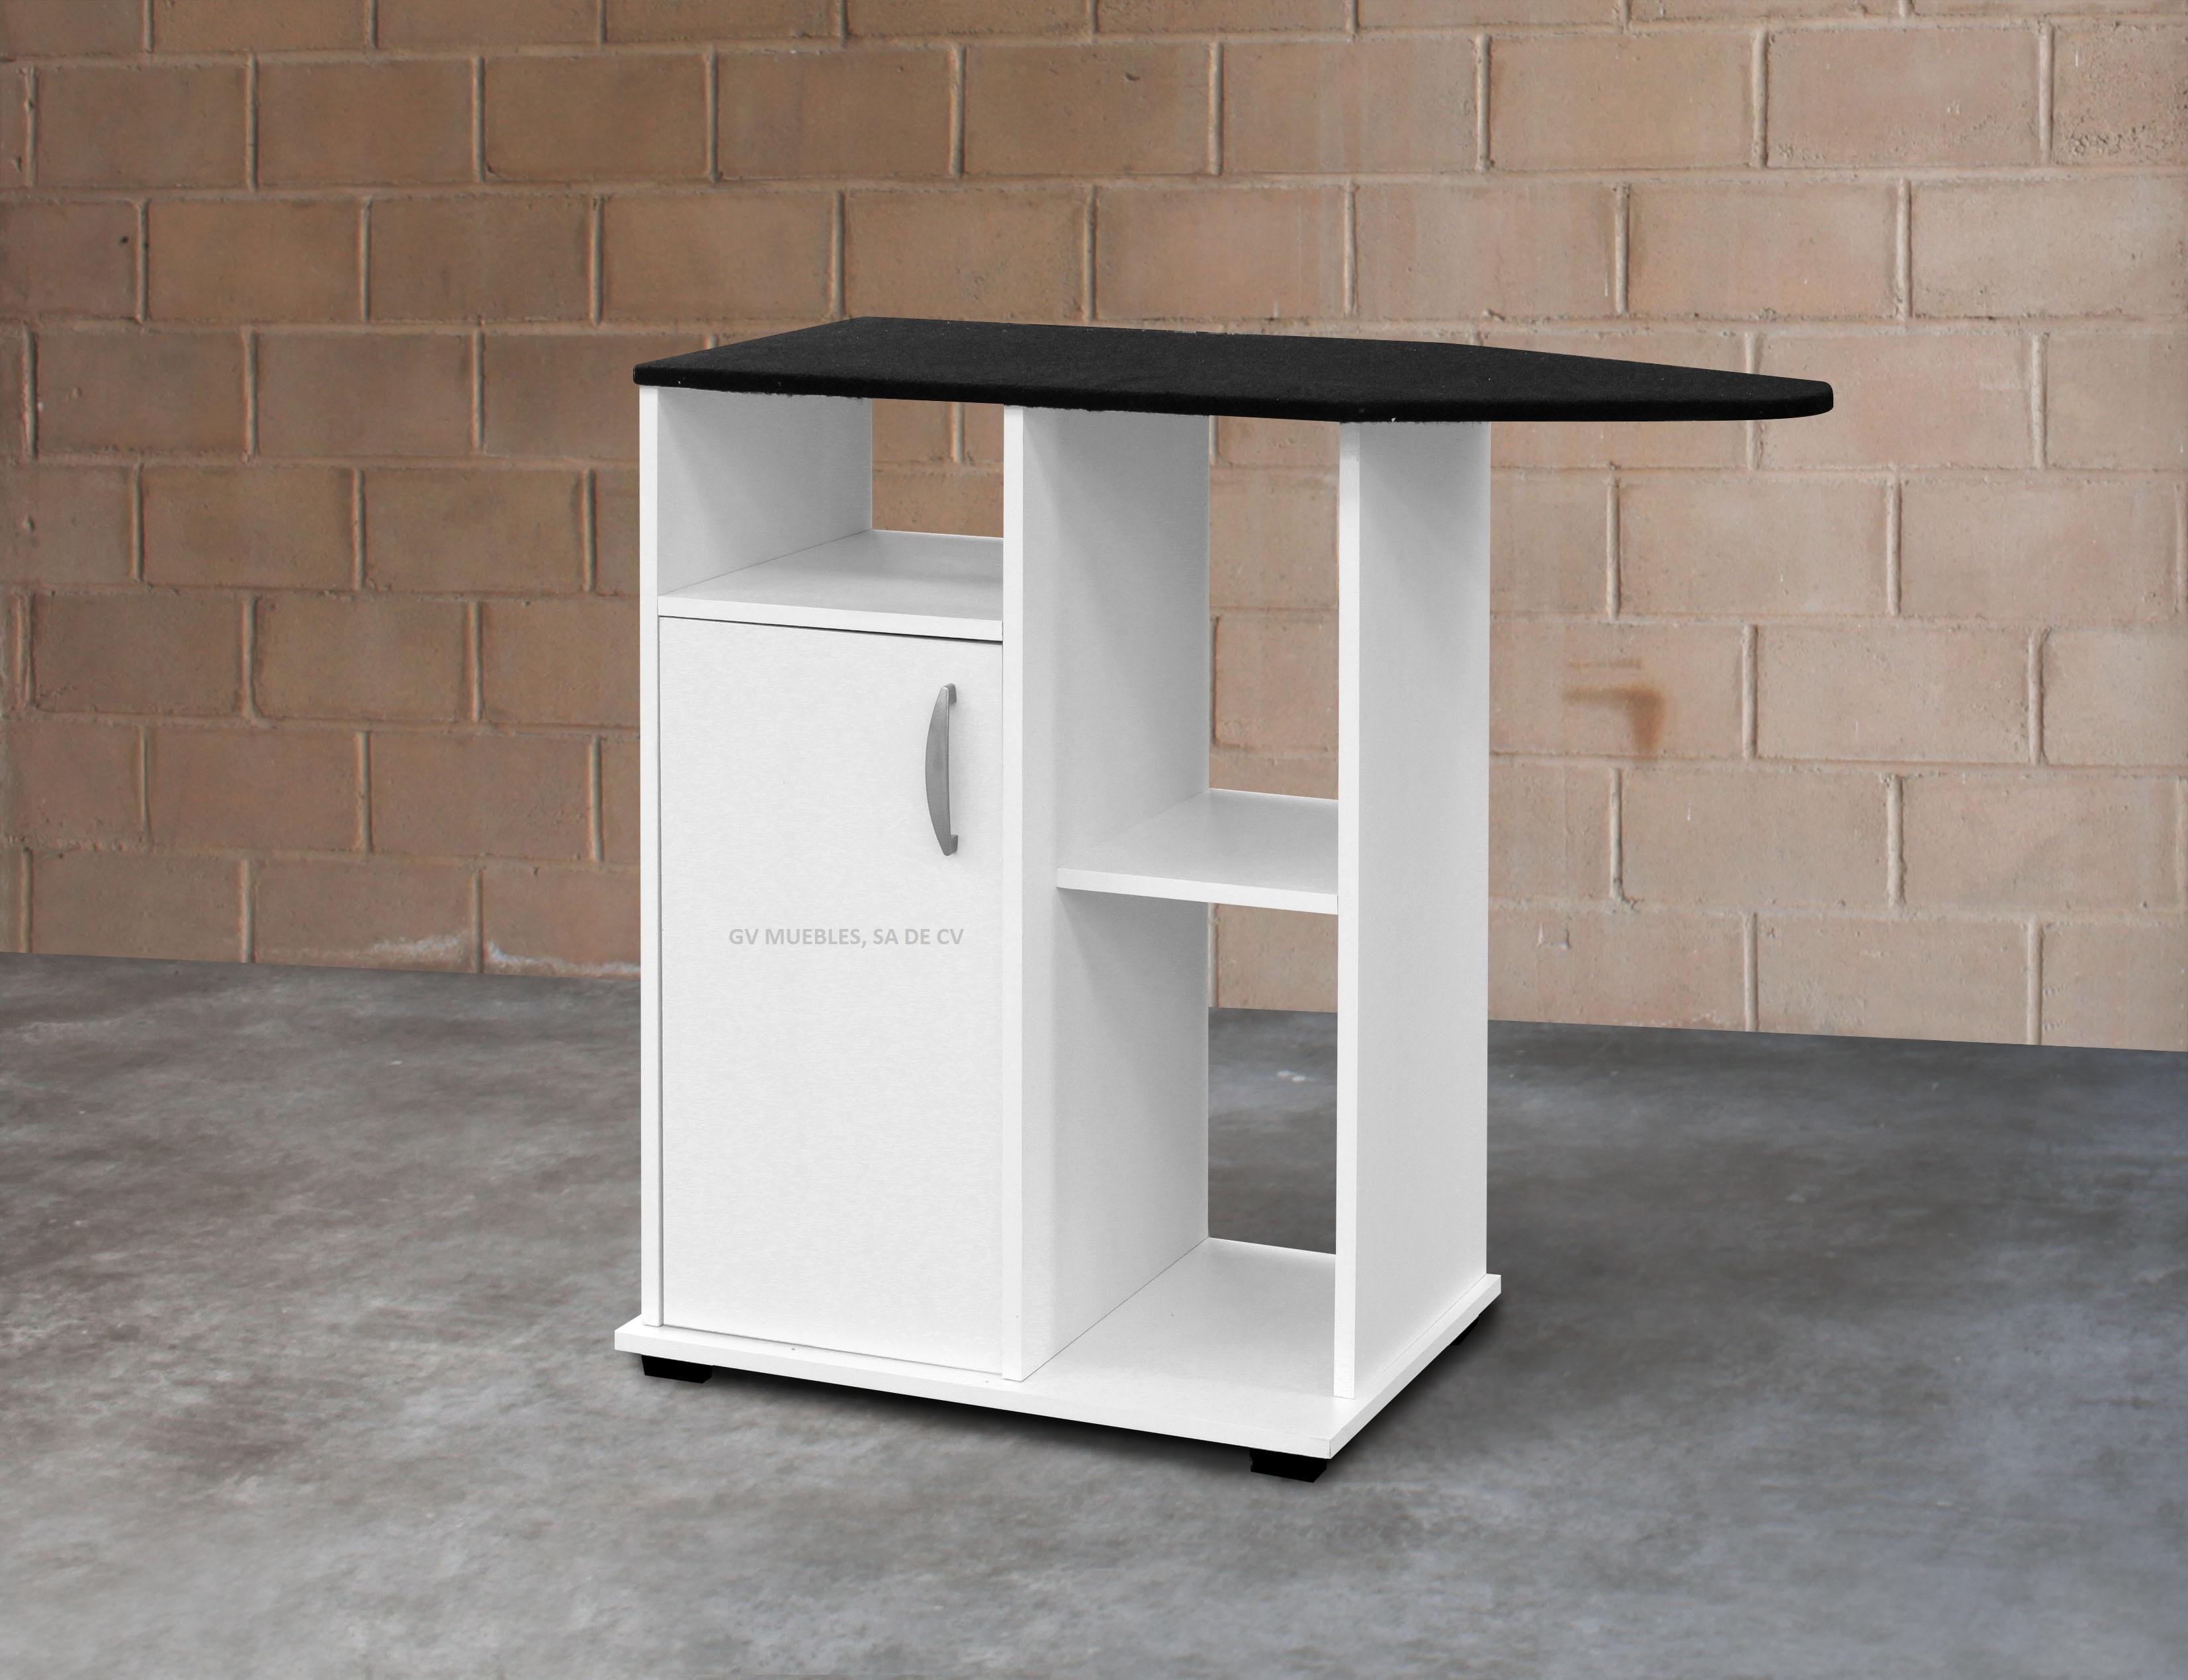 Mueble de planchar siena - Mueble de planchar ...